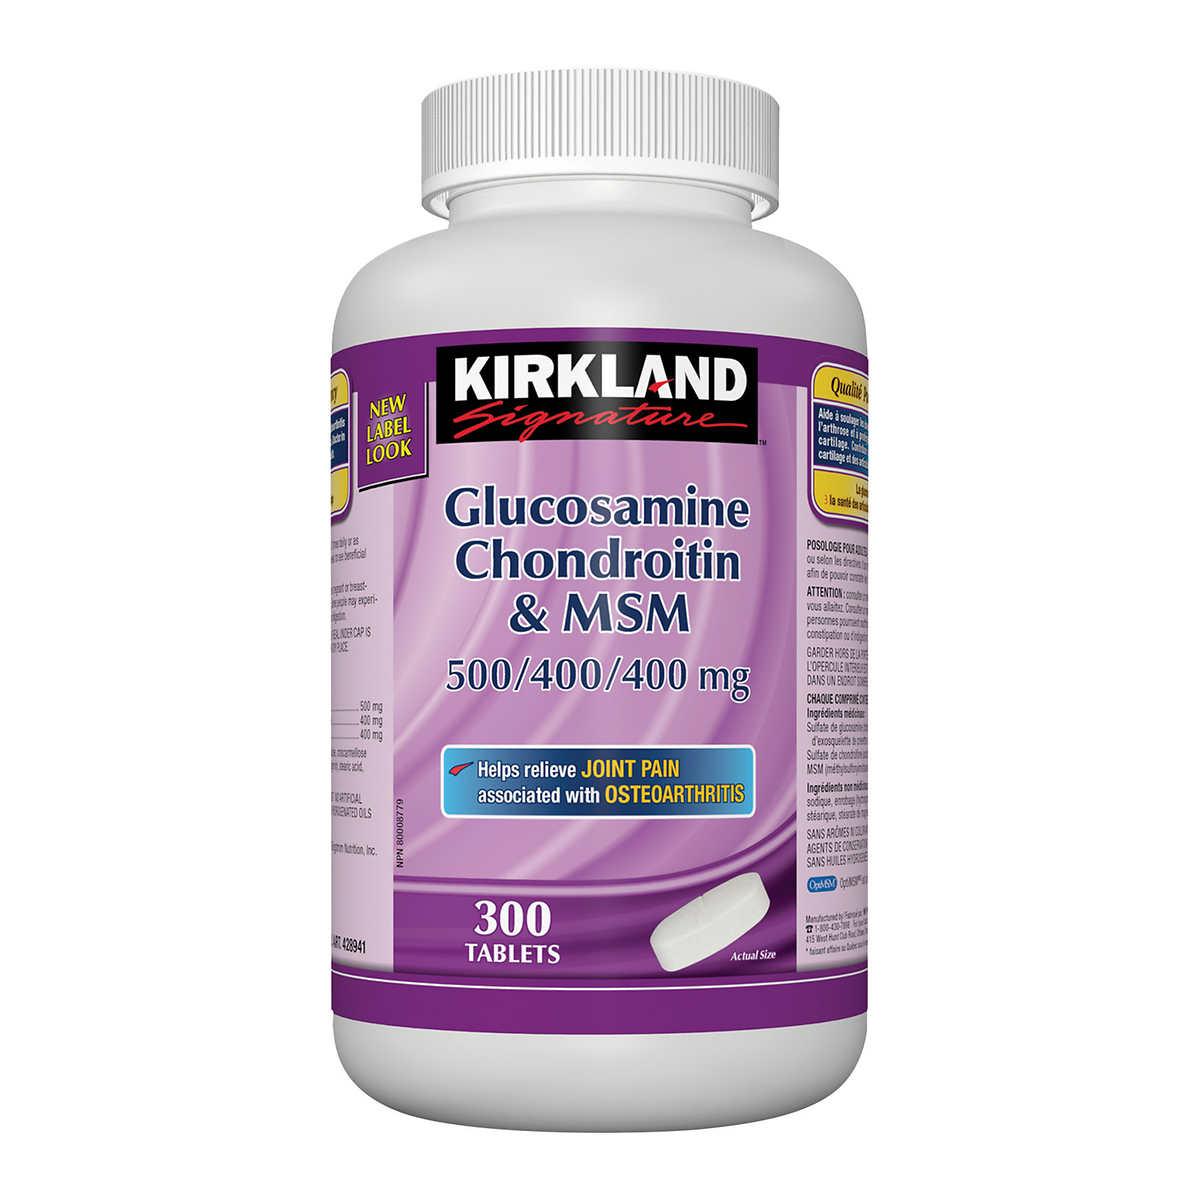 Kirkland Signature Glucosamine, Chondroitin and MSM -- 300 Tablets